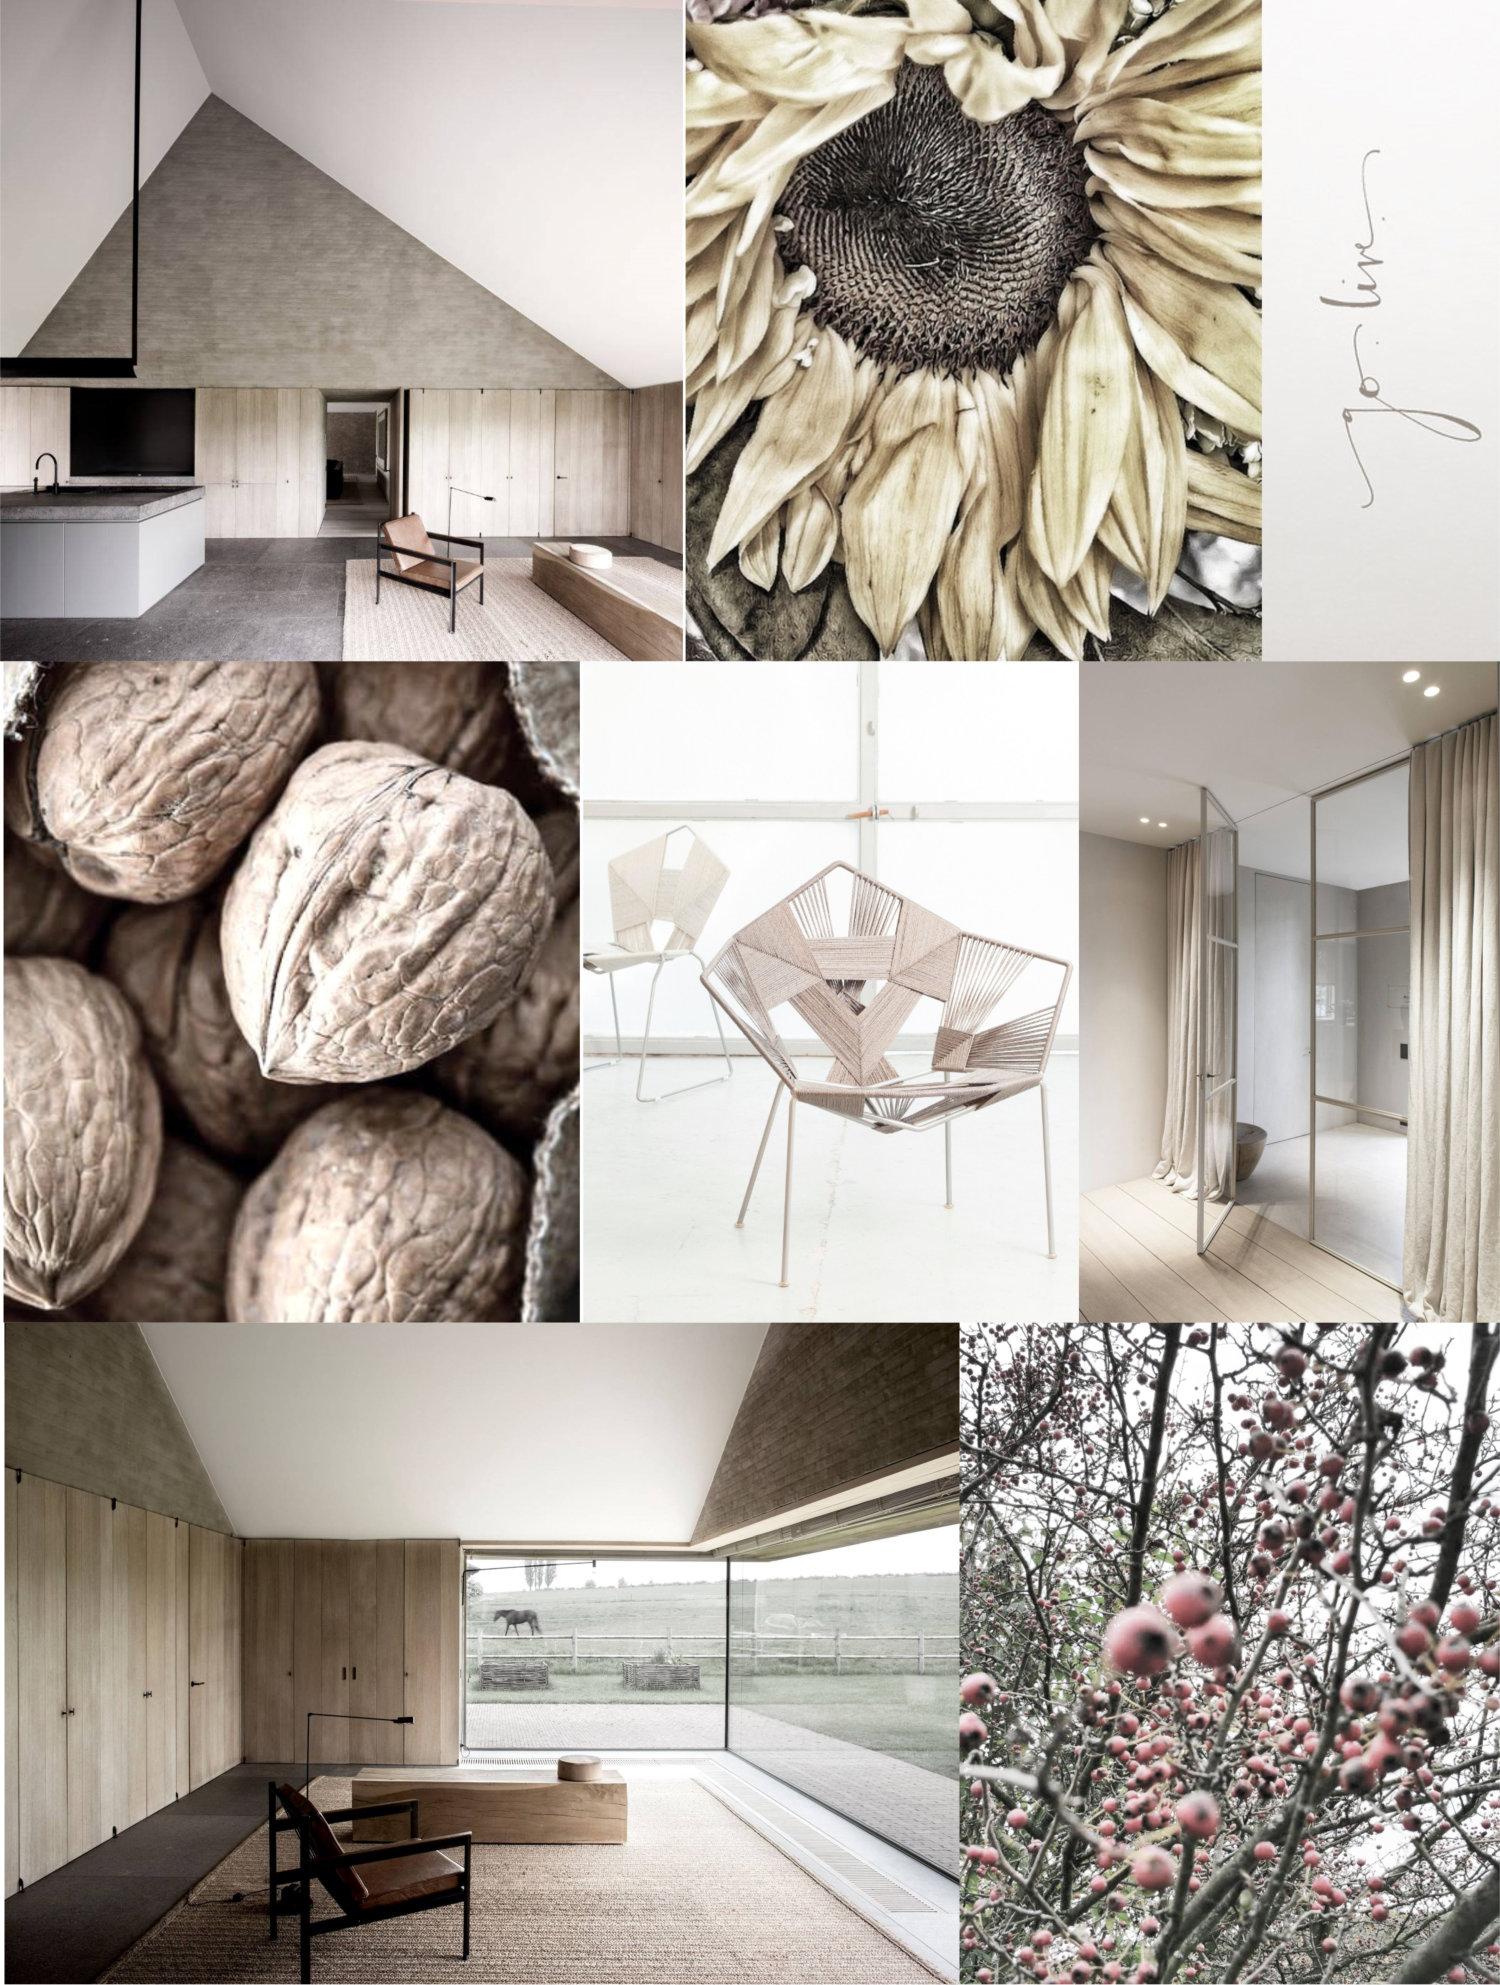 interiorlines_mood_misty_kicsi.jpg